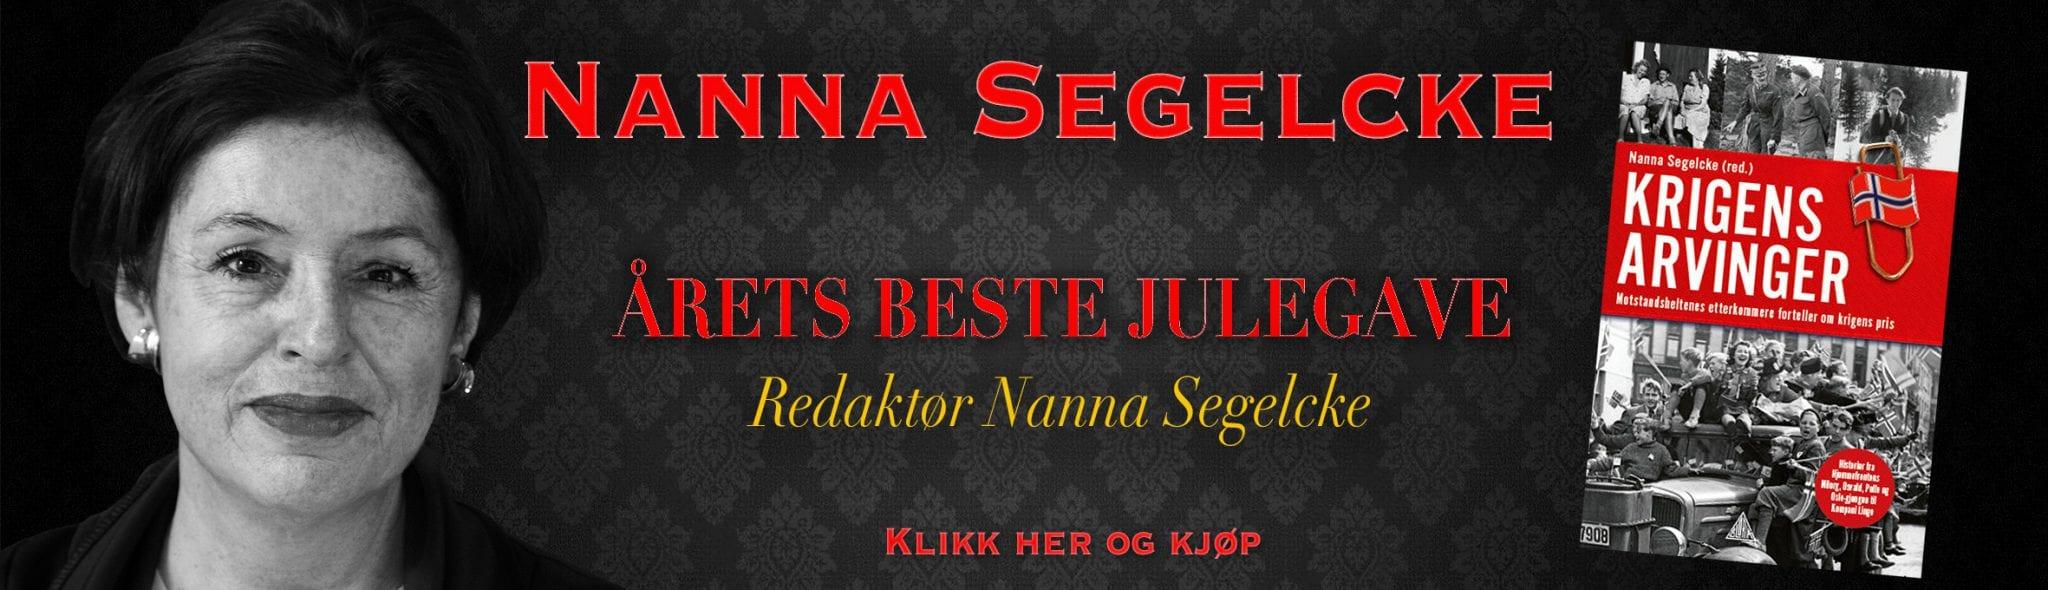 Nanna Segelcke Krigens Arvingr